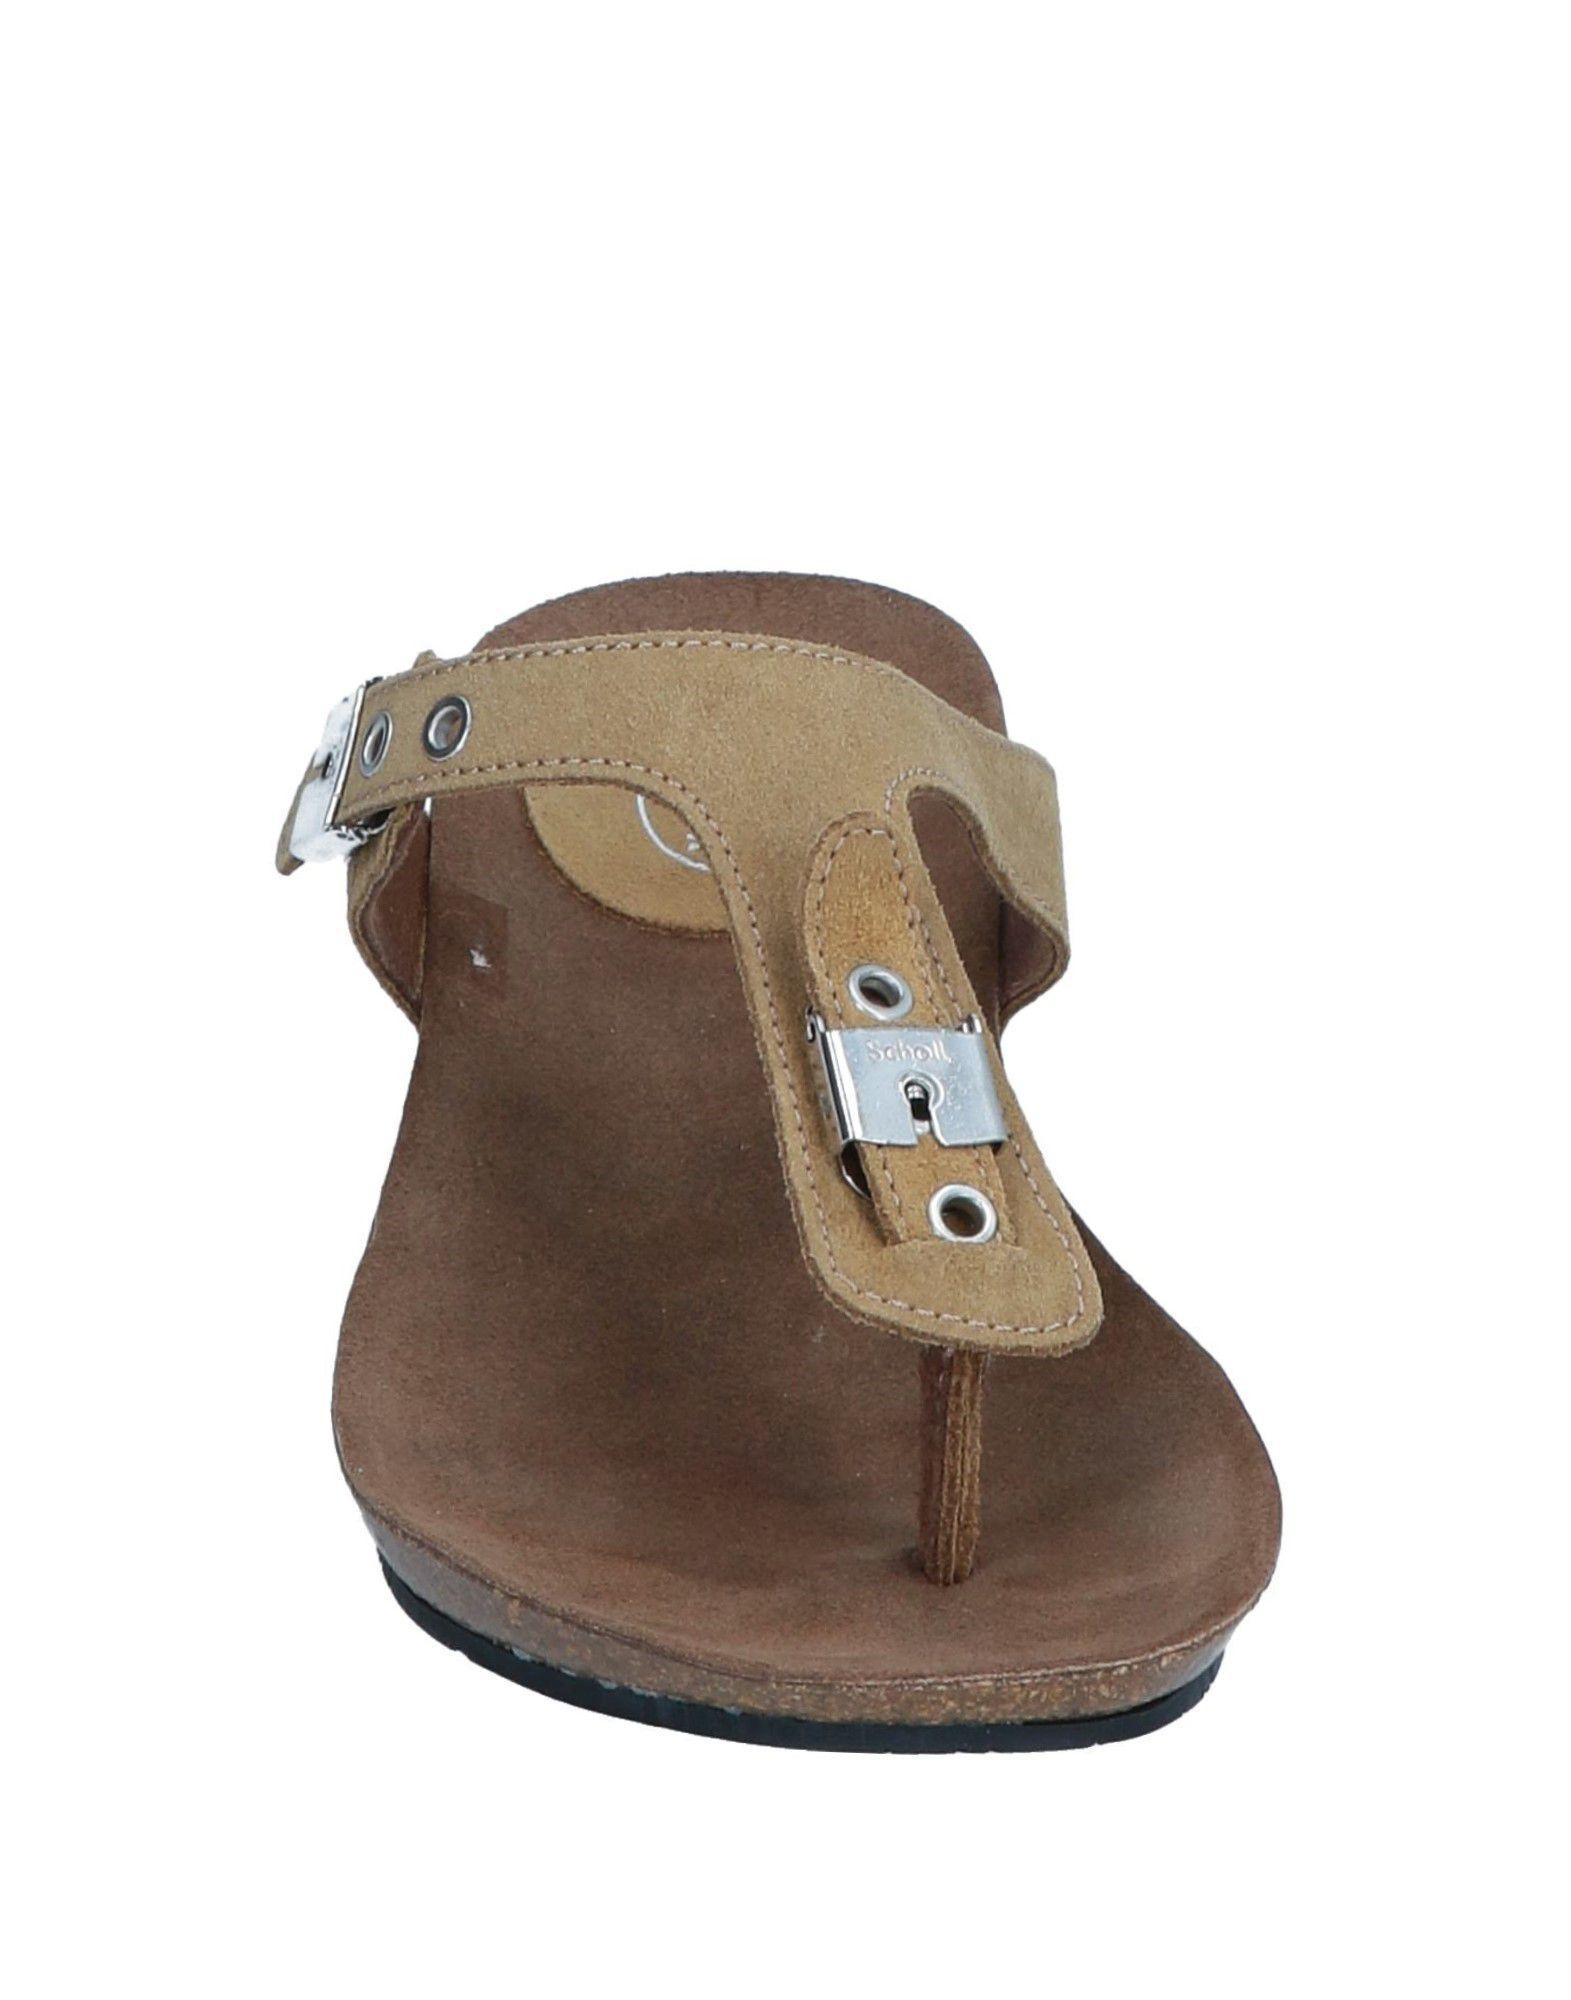 Scholl Dianetten Damen  beliebte 11548599UD Gute Qualität beliebte  Schuhe eb625e